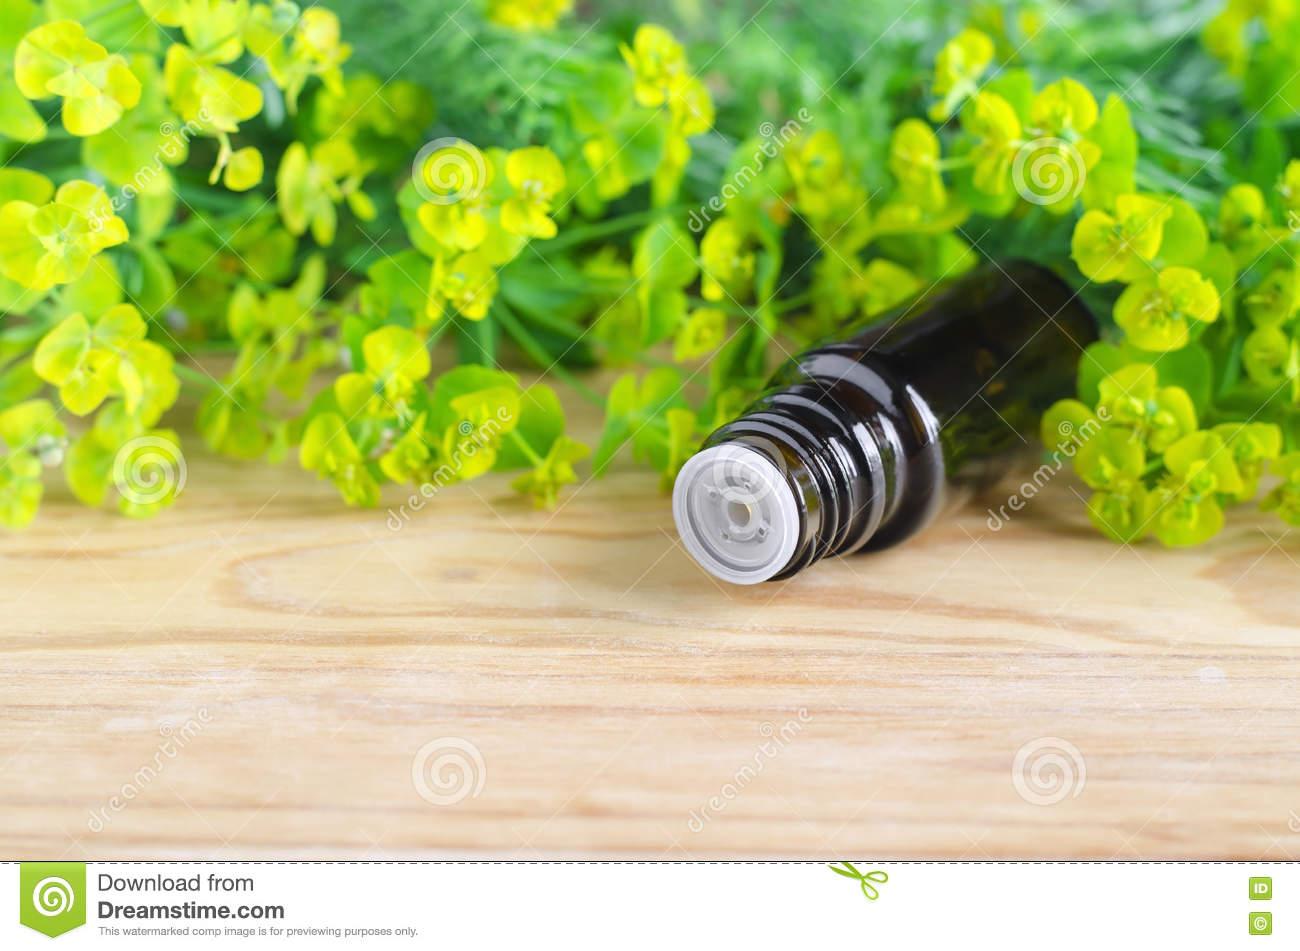 Bottle Of Euphorbia Cyparissias, Cypress Spurge Extract (Milkweed.